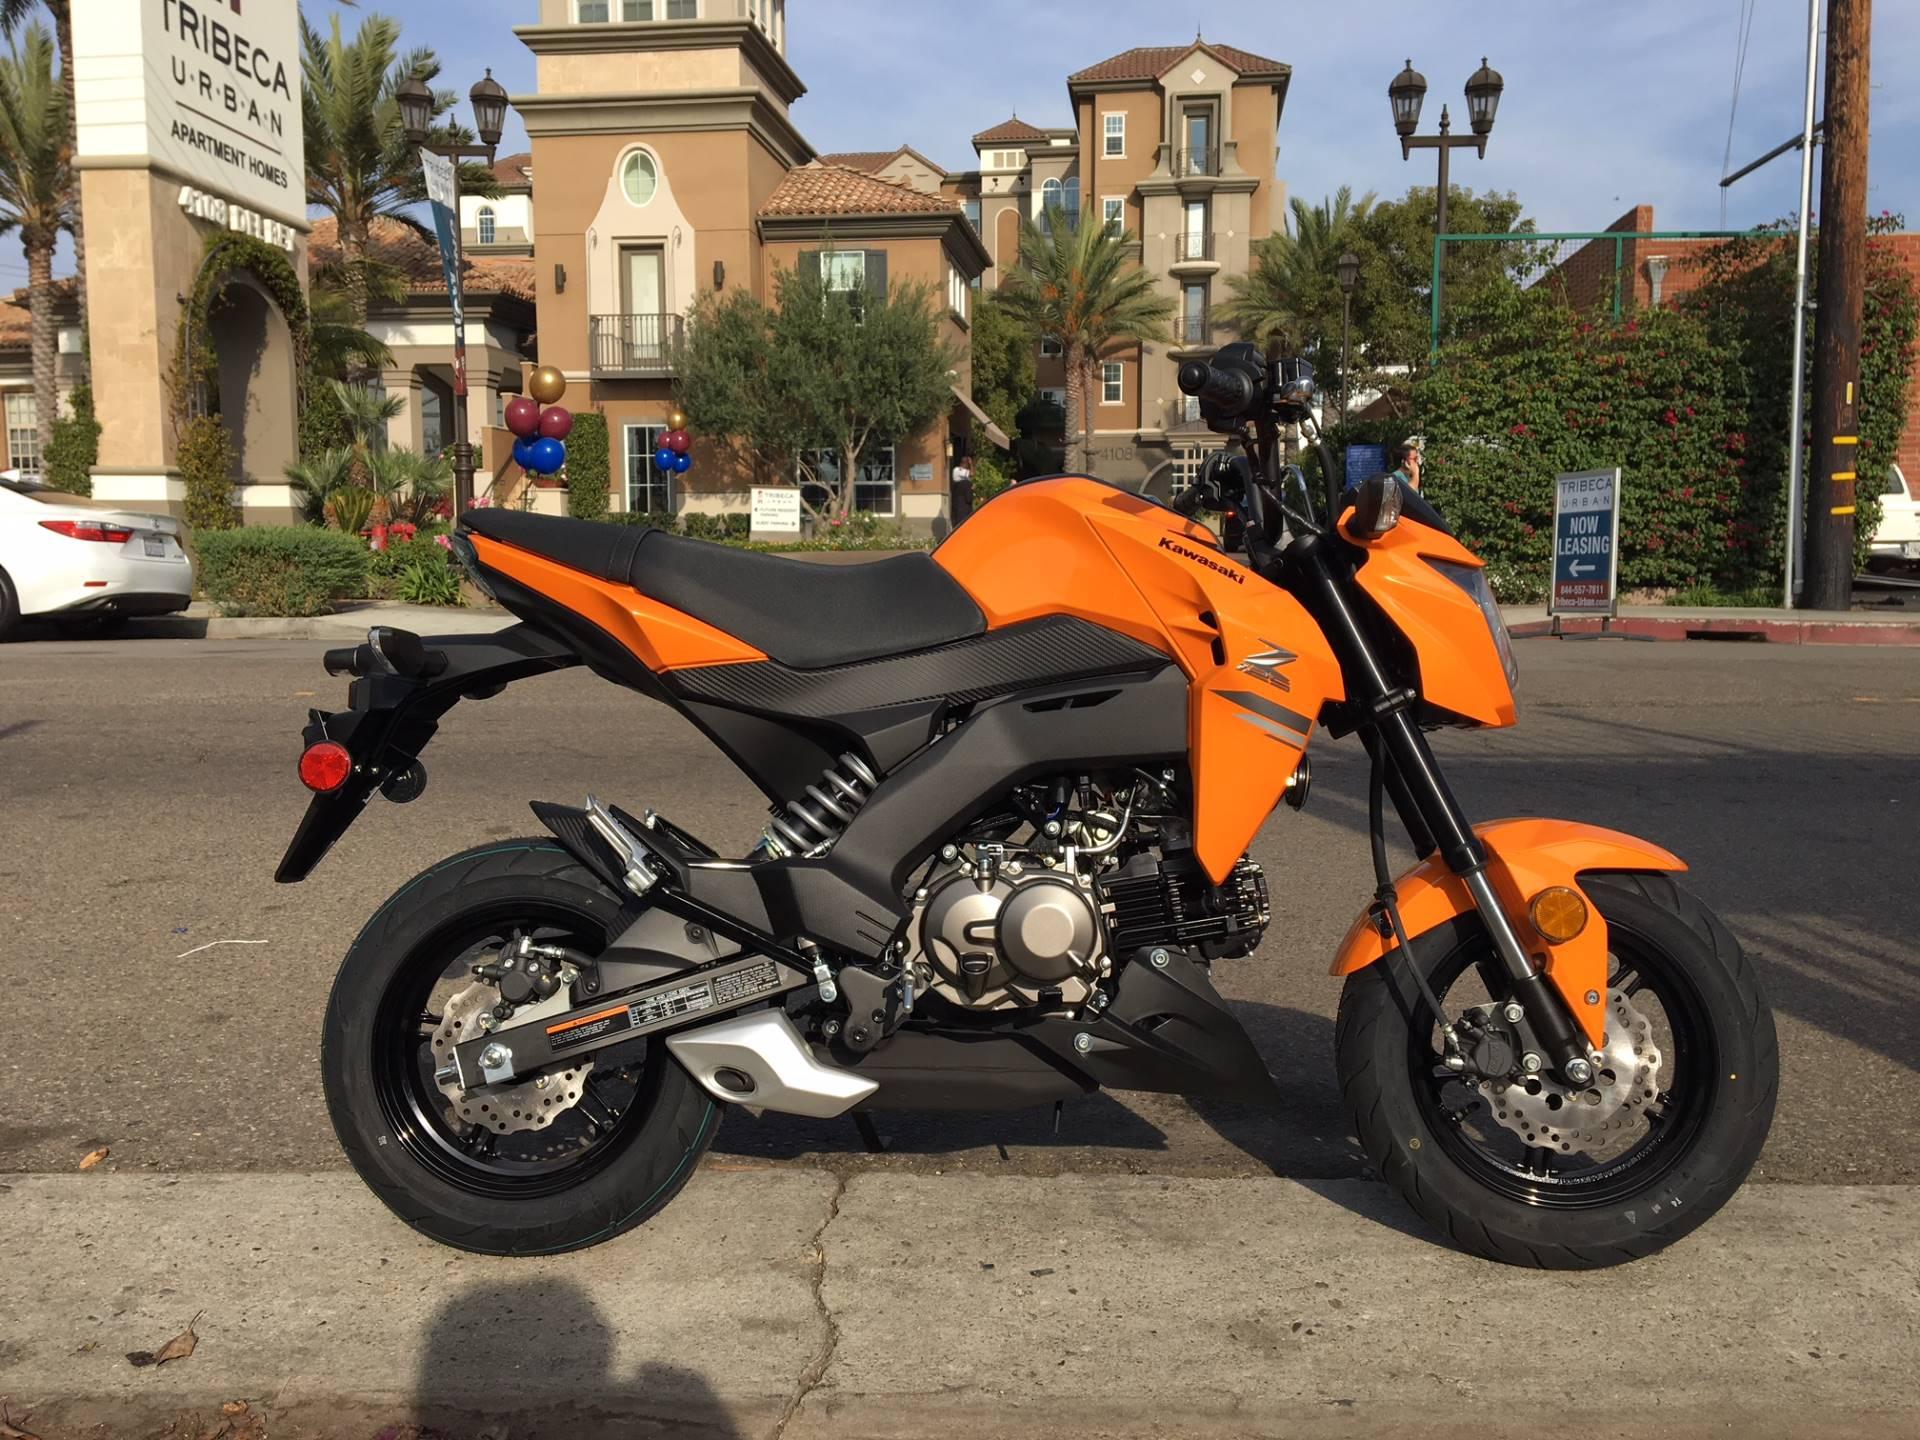 2019 Kawasaki Z125 Pro Motorcycles Marina Del Rey California